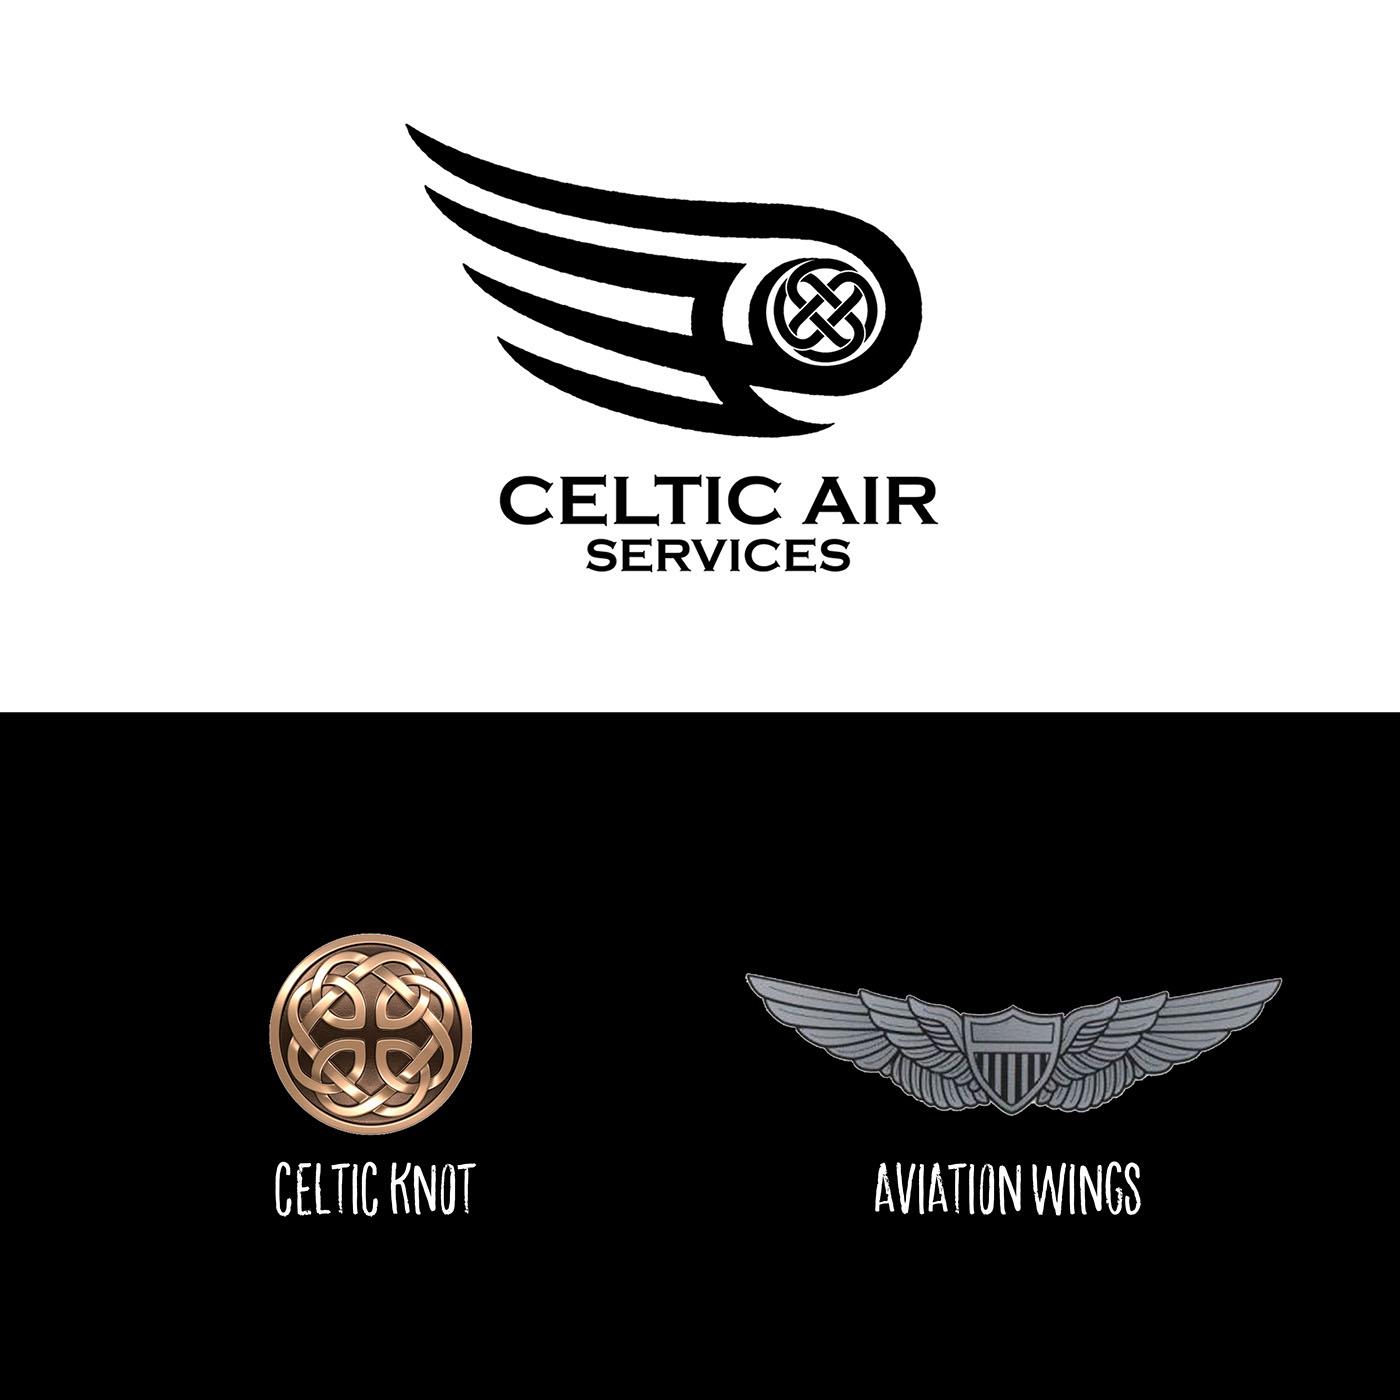 airport luxury Celtic aviation nova scotia Canada wings